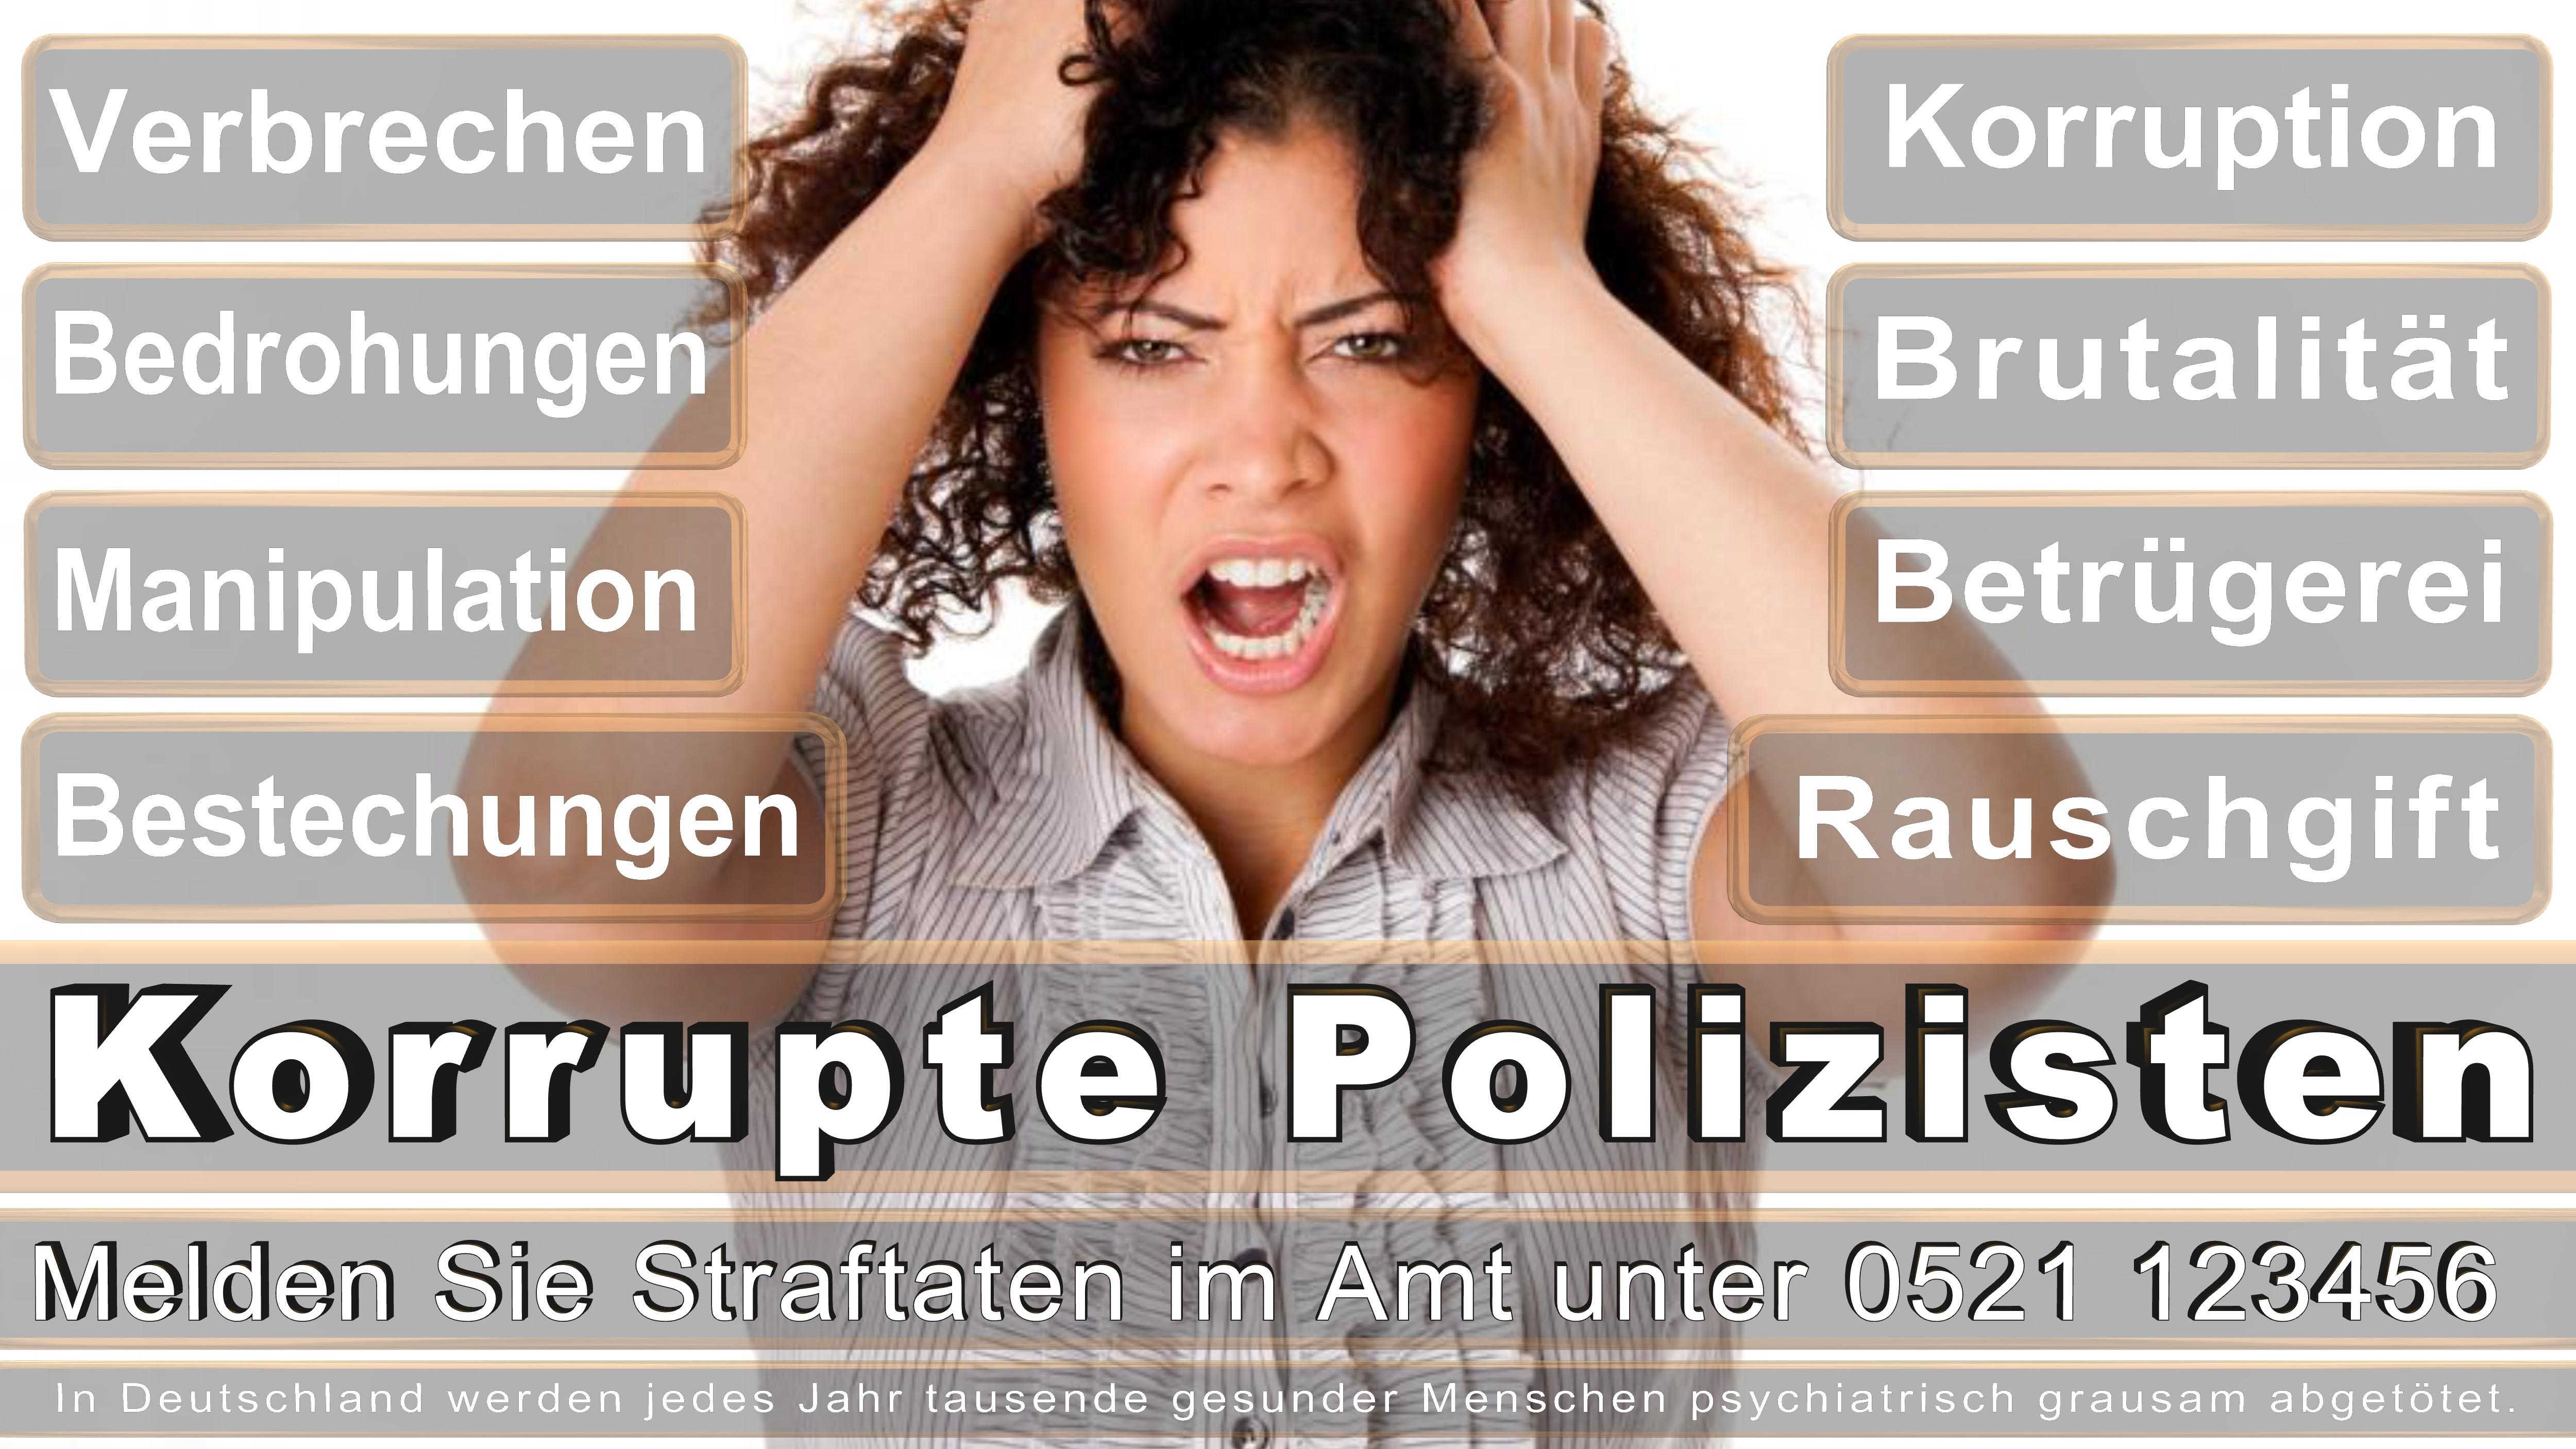 Polizei-Bielefeld-Polizei-Bielefeld-Polizei-Bielefeld (189)